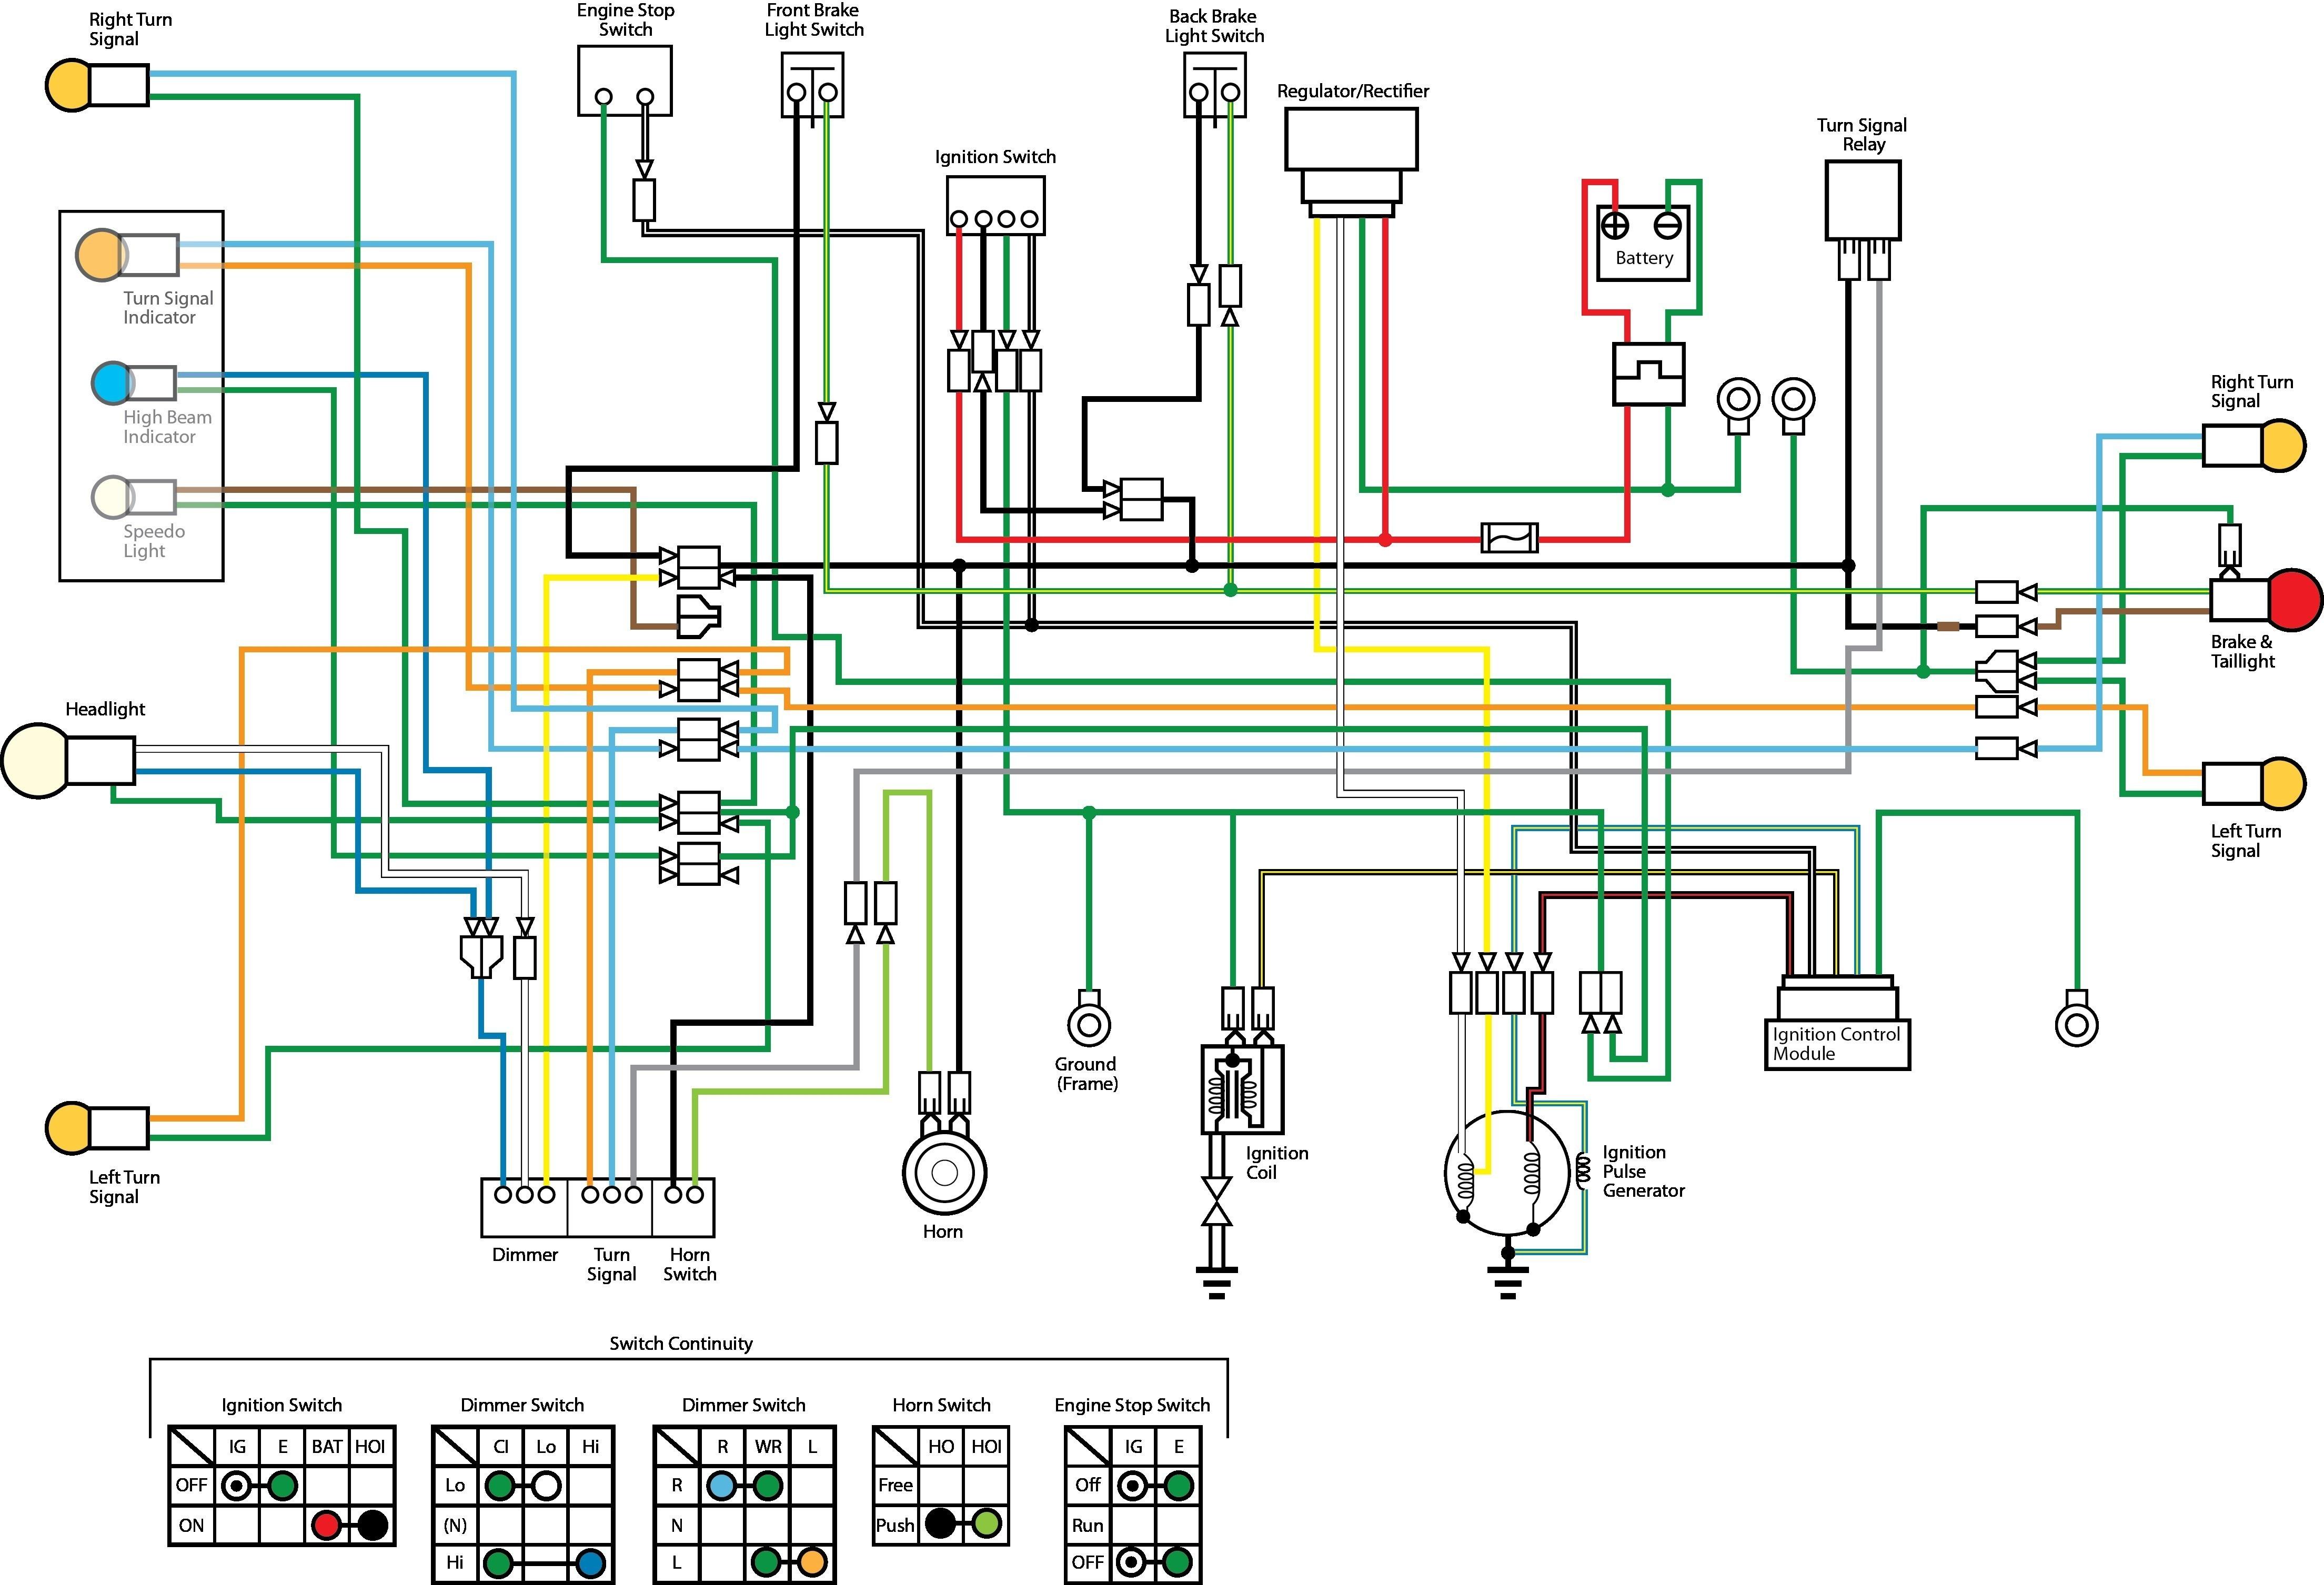 Motorcycle Engine Diagram Wiring Diagram Brake Light Switch Refrence Universal Motorcycle Of Motorcycle Engine Diagram